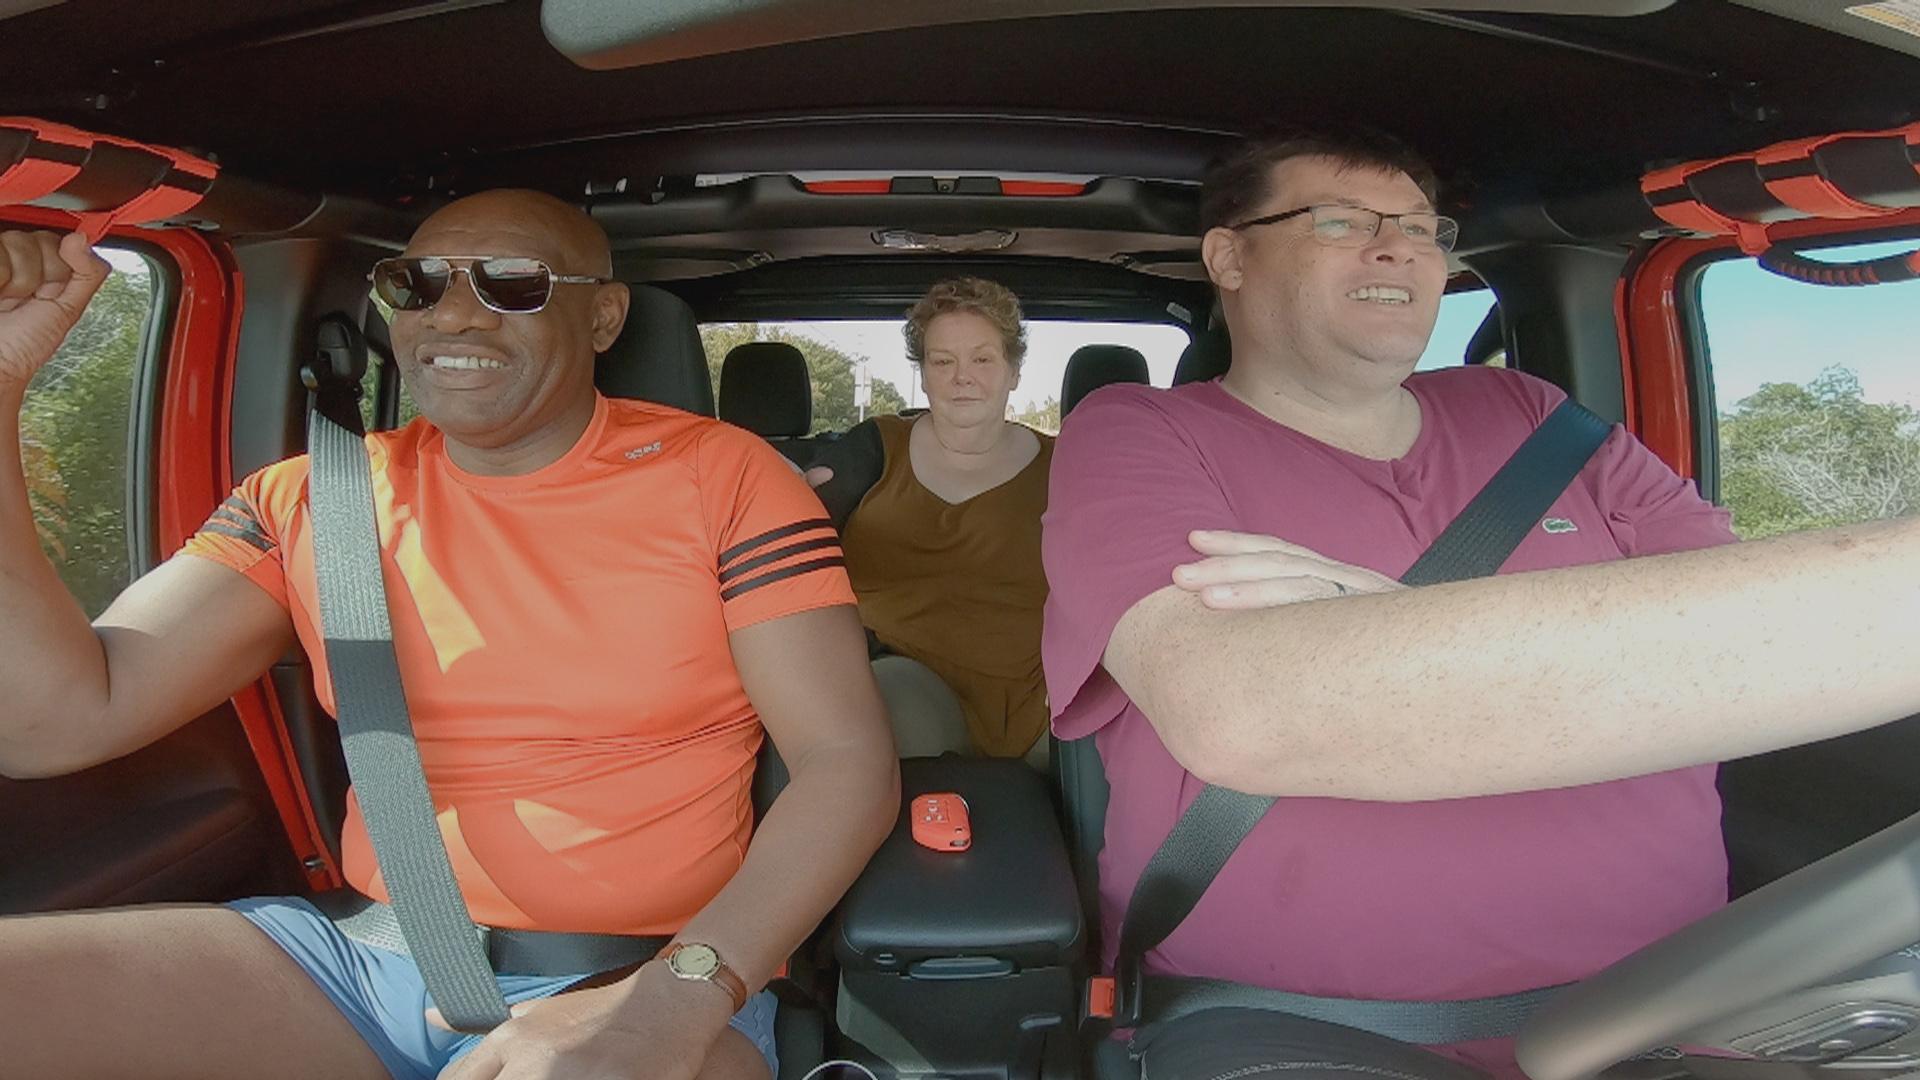 Shaun Wallace, Anne Hegarty y Mark Labbett conducen su coche de alquiler